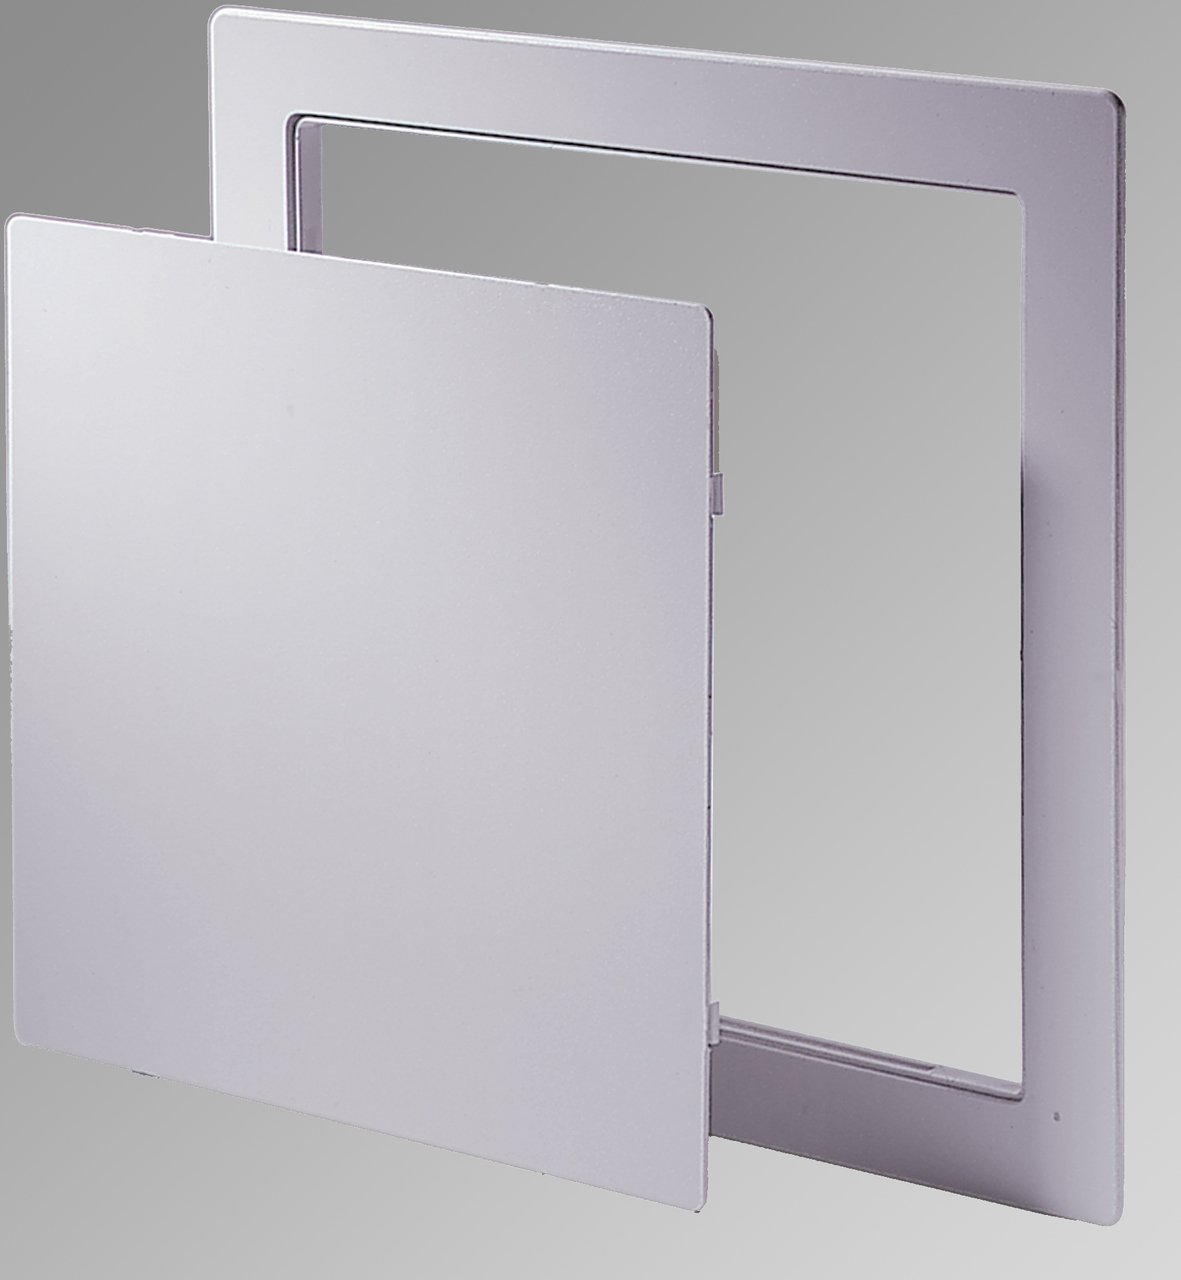 Acudor PA-3000 18 x 18 Plastic Access Door 18'' x 18''